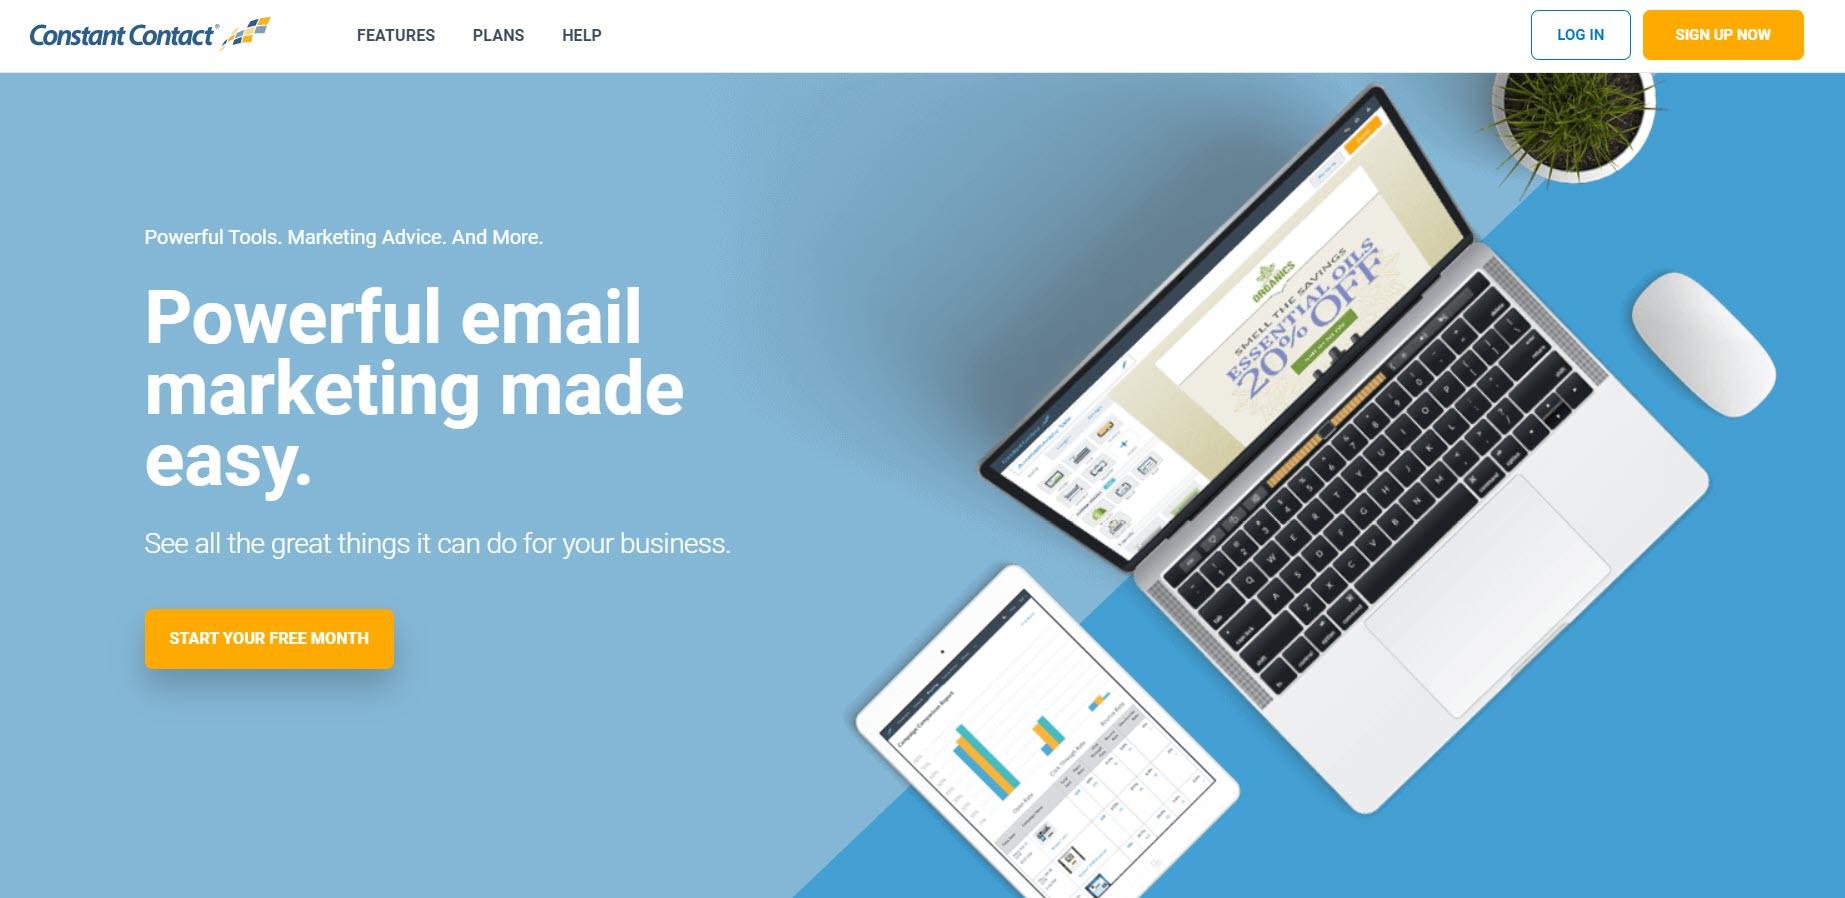 Mailchimp alternatives-continuous contact